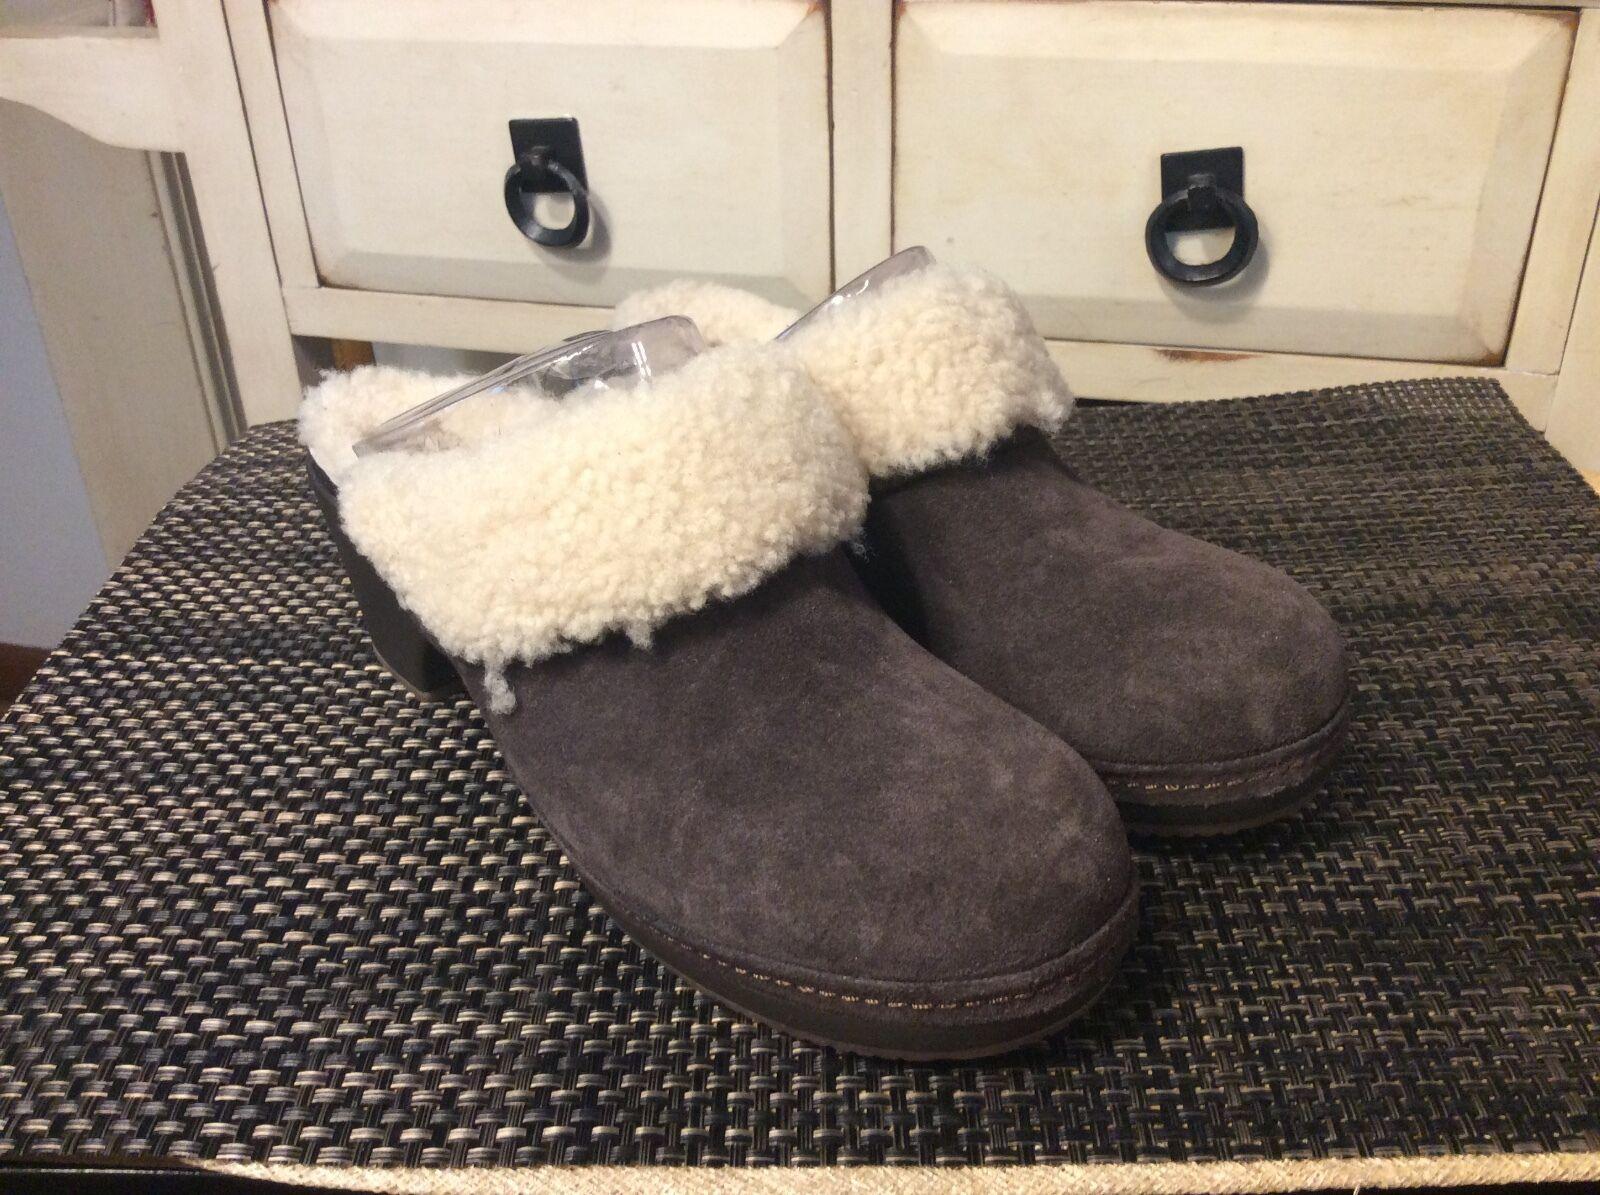 qualità autentica donna's Crocs Sarah Luxe Shearling Lined Clog Clog Clog Marrone Item  203413 Sz W7  al prezzo più basso